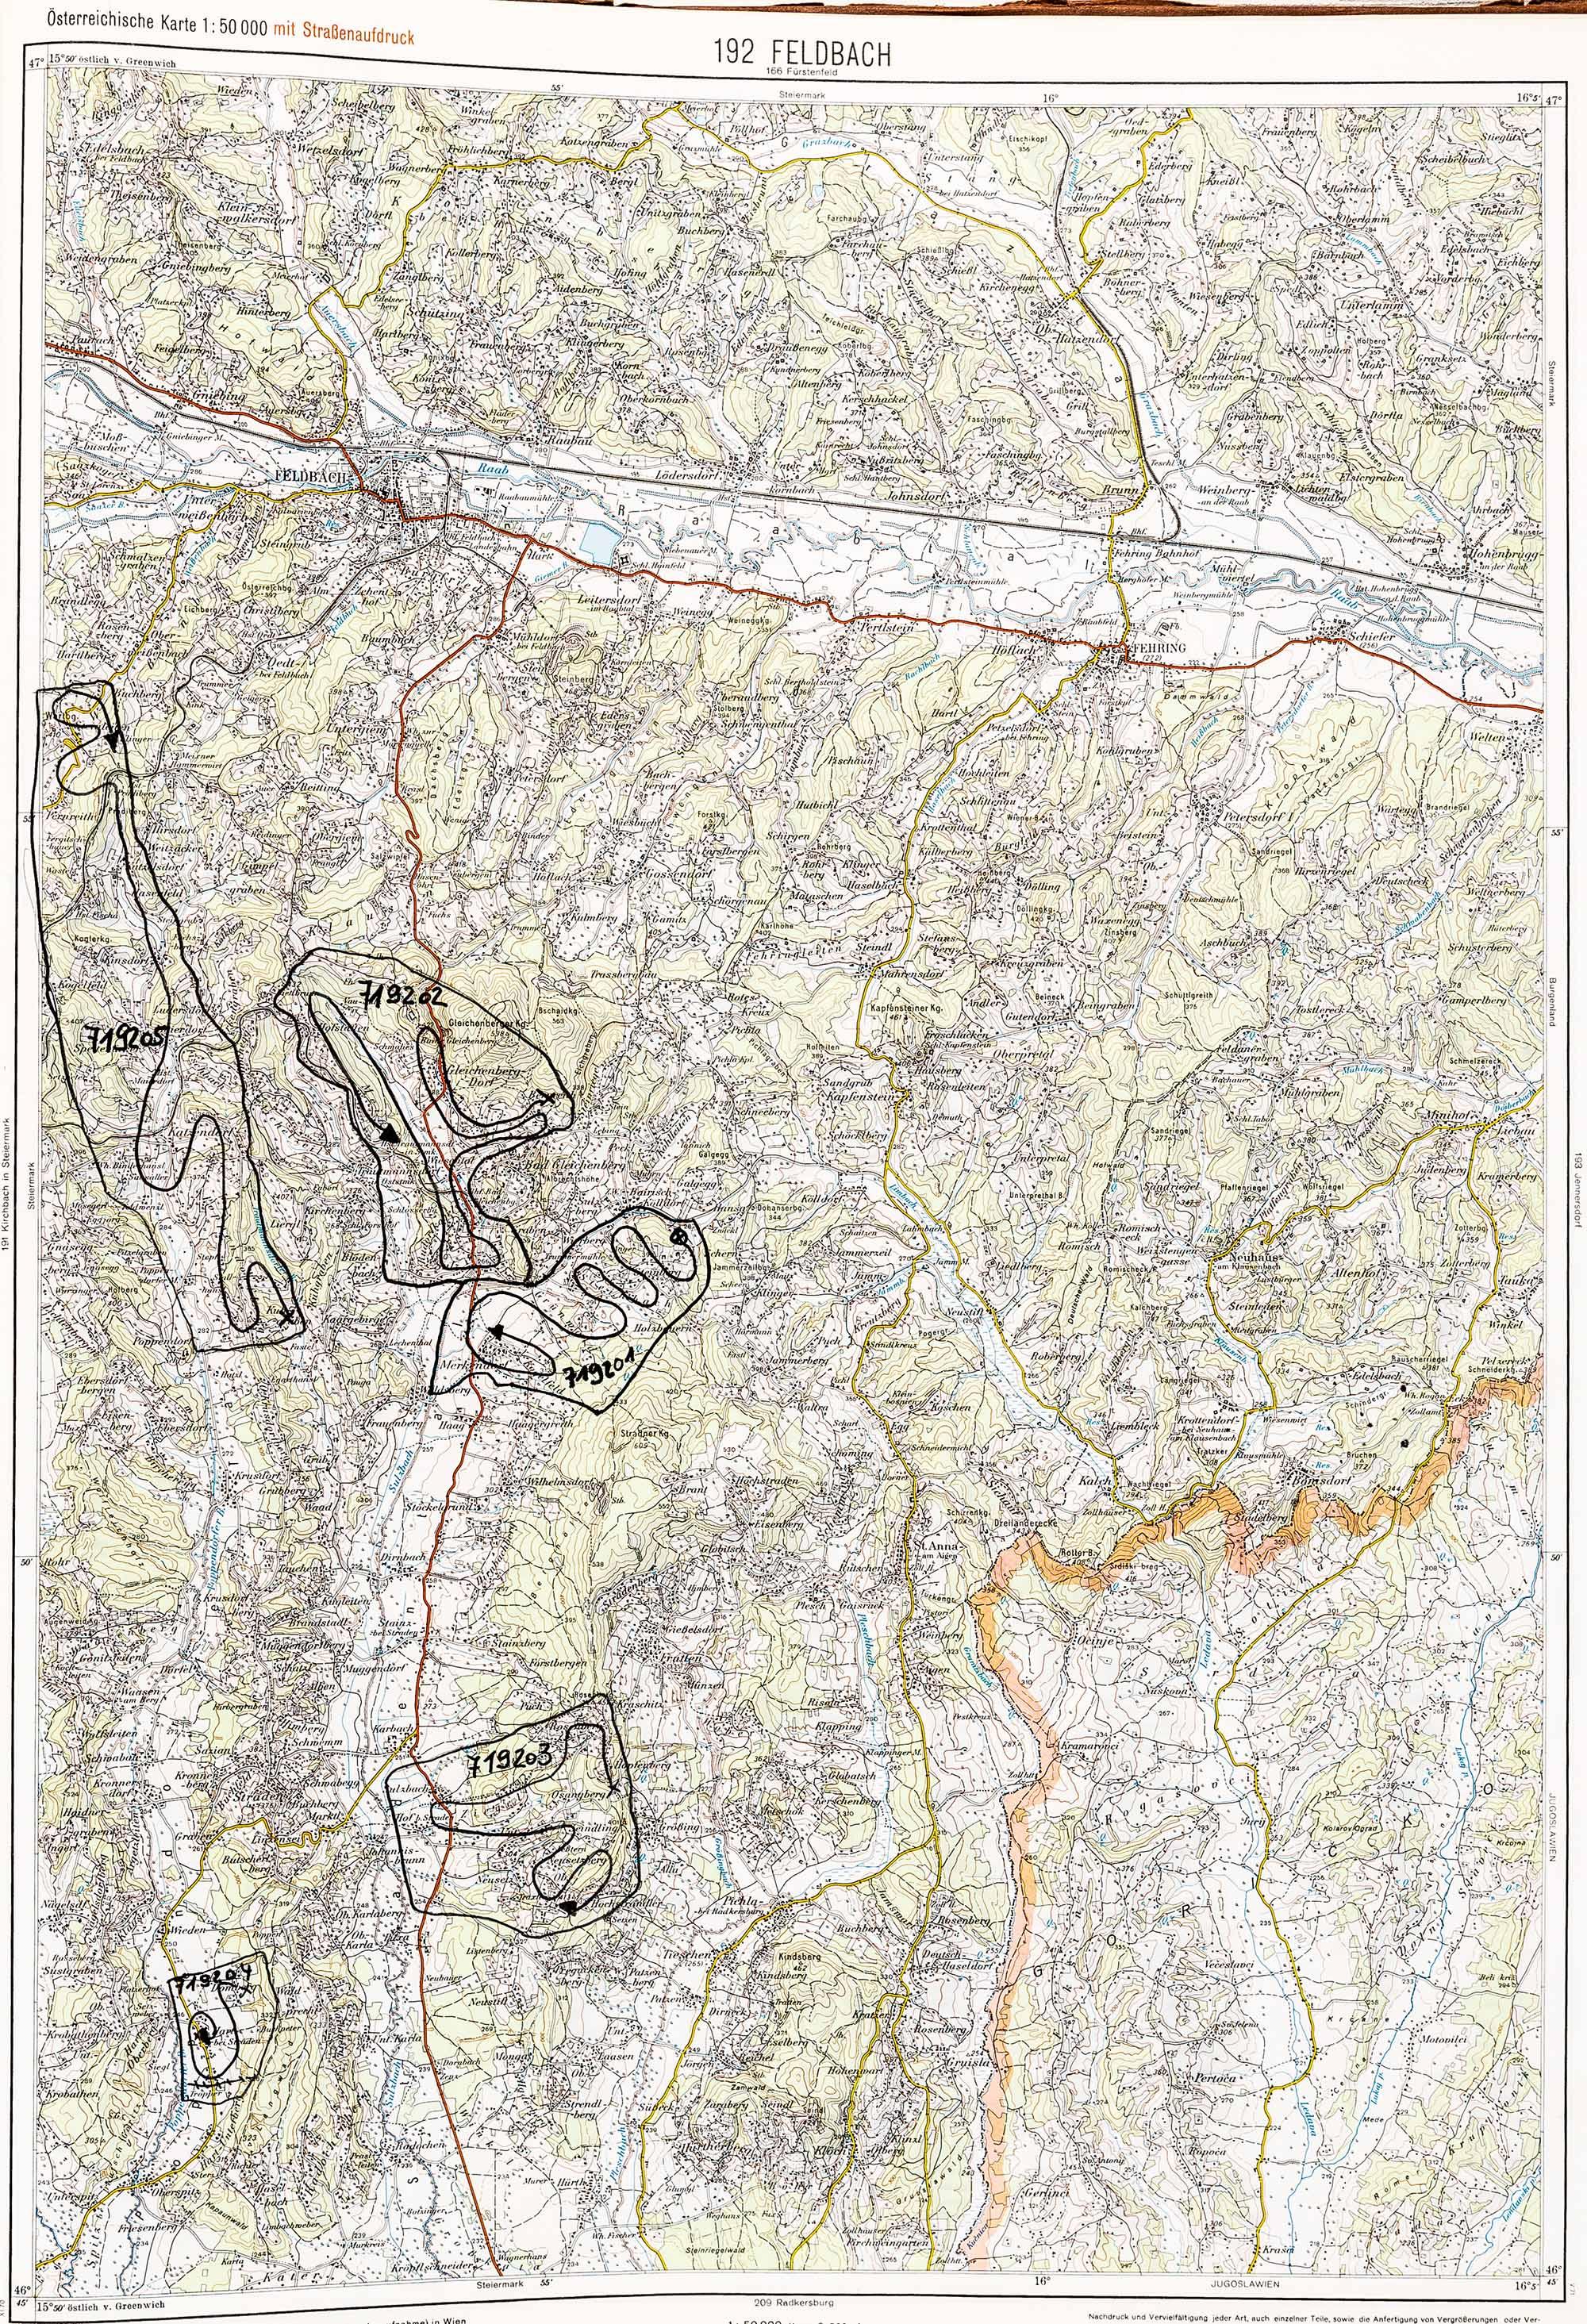 1975-1979 Karte 192